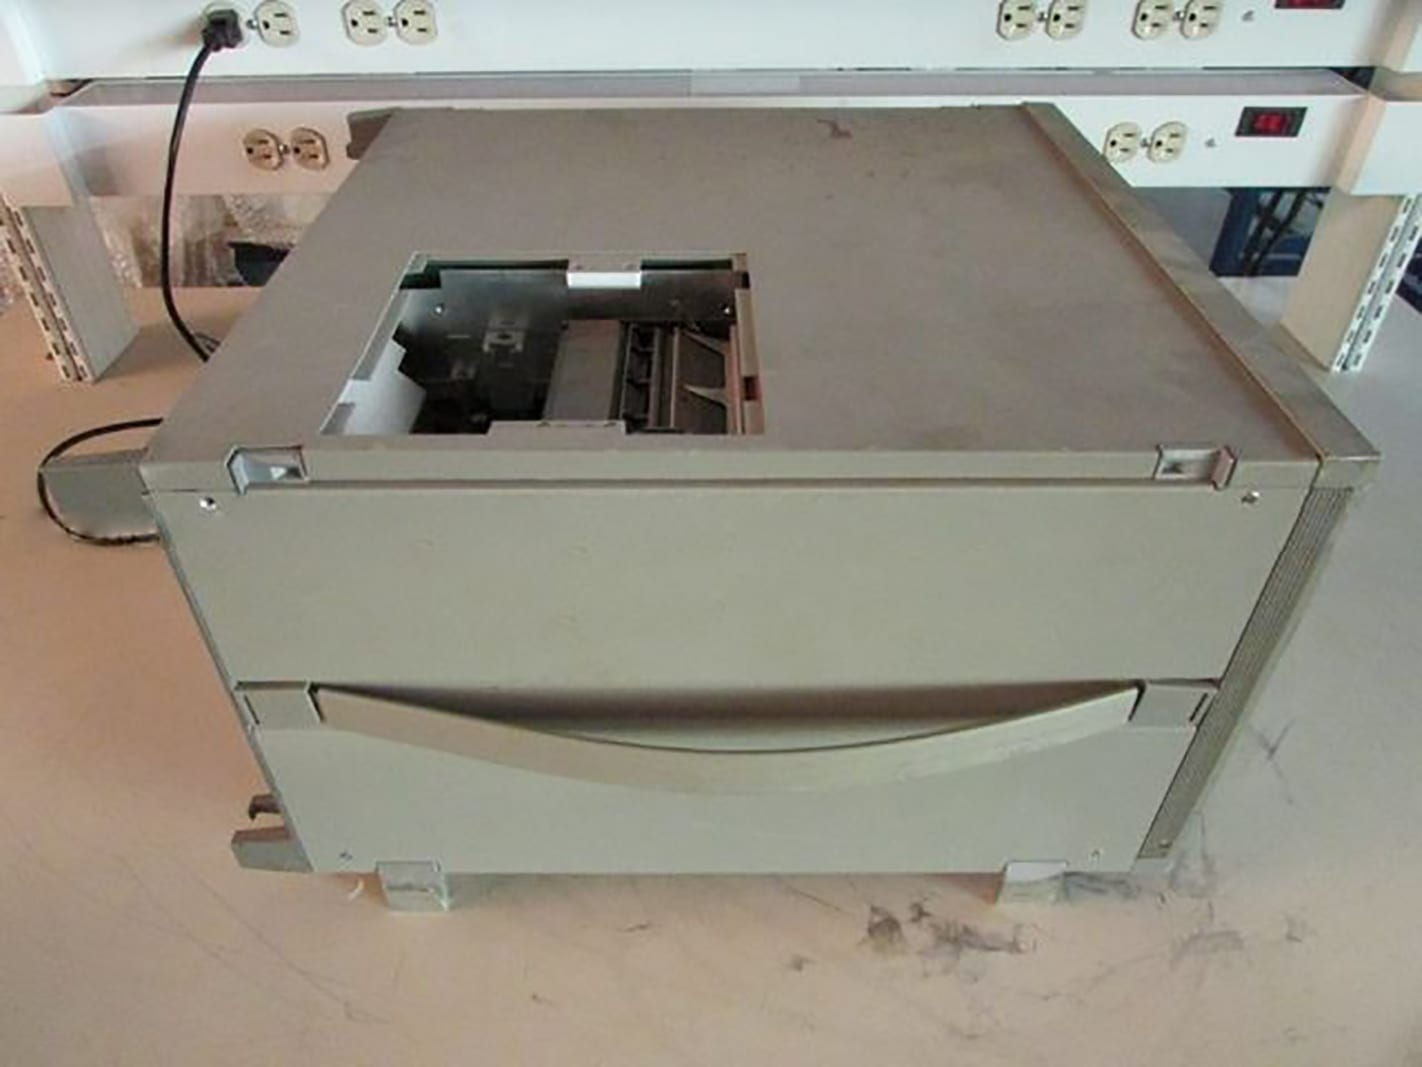 Anritsu MS 96 A Optical Spectrum Analyzer Refurbished